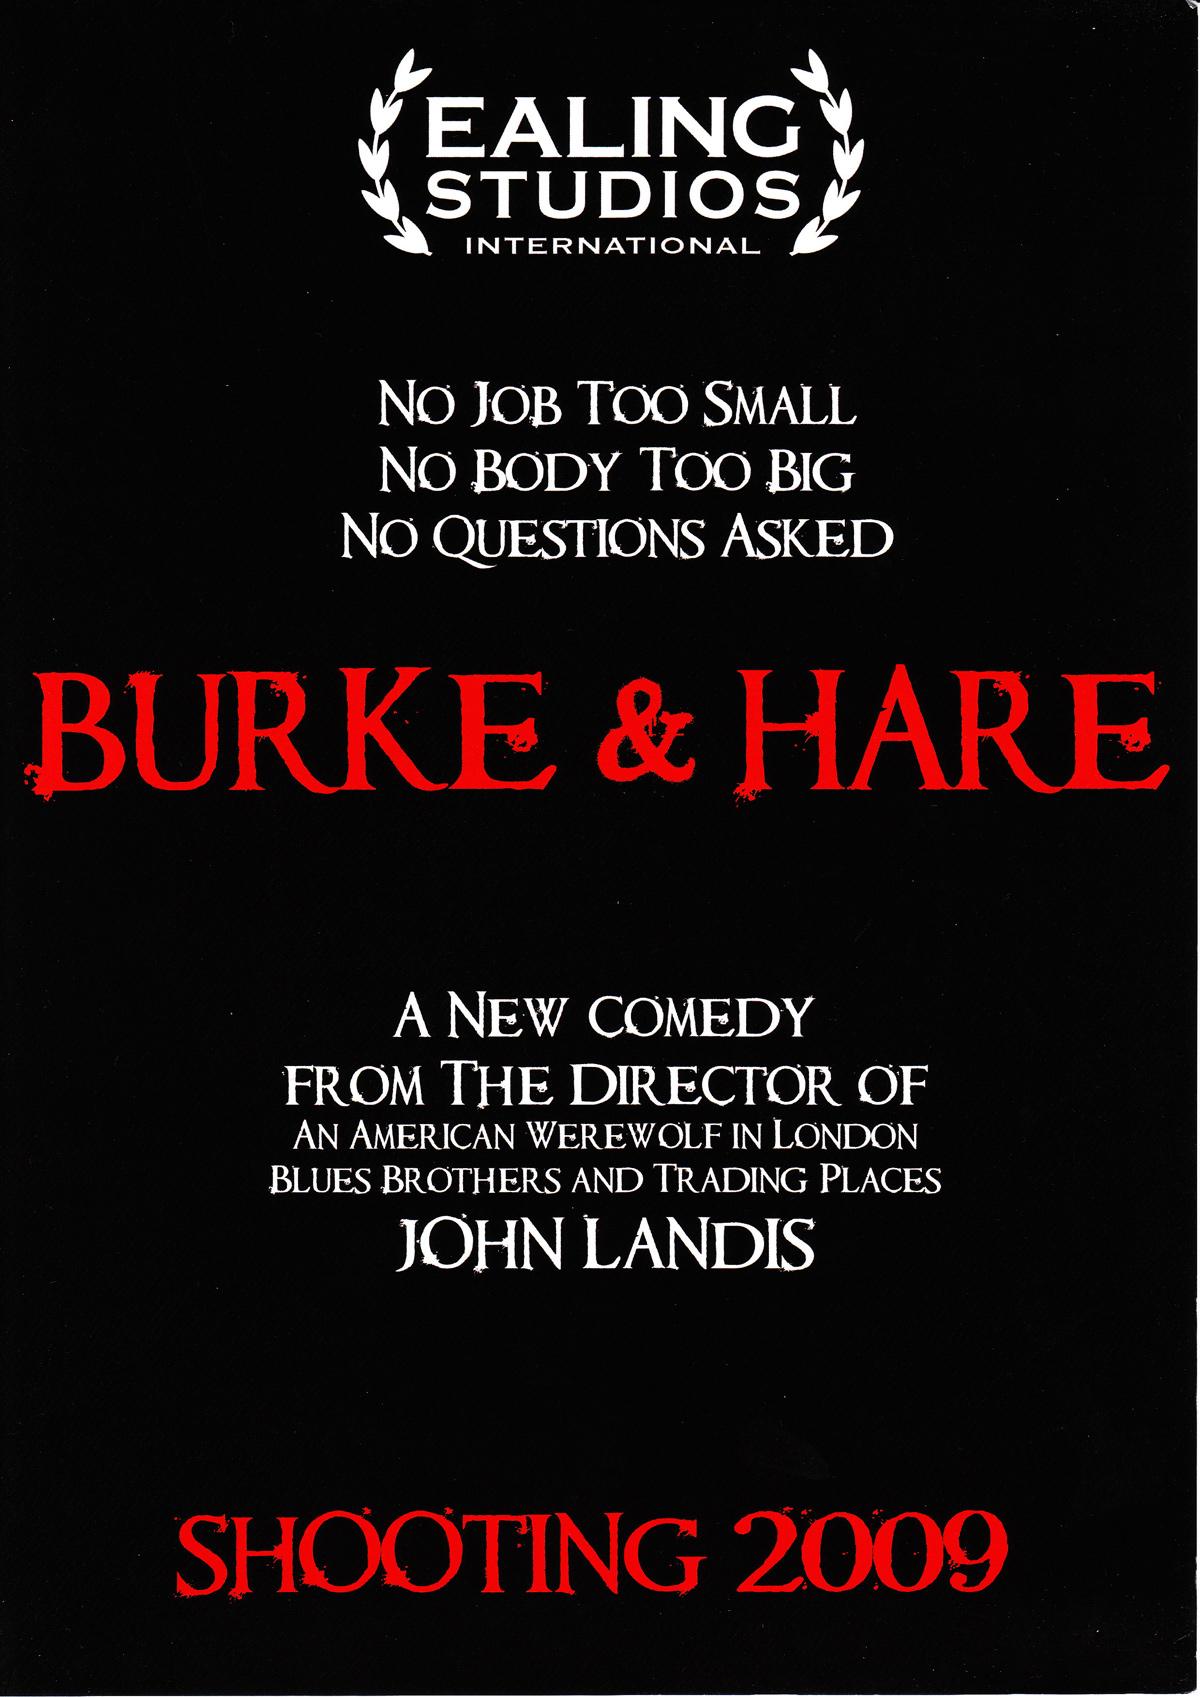 burkehare2110209